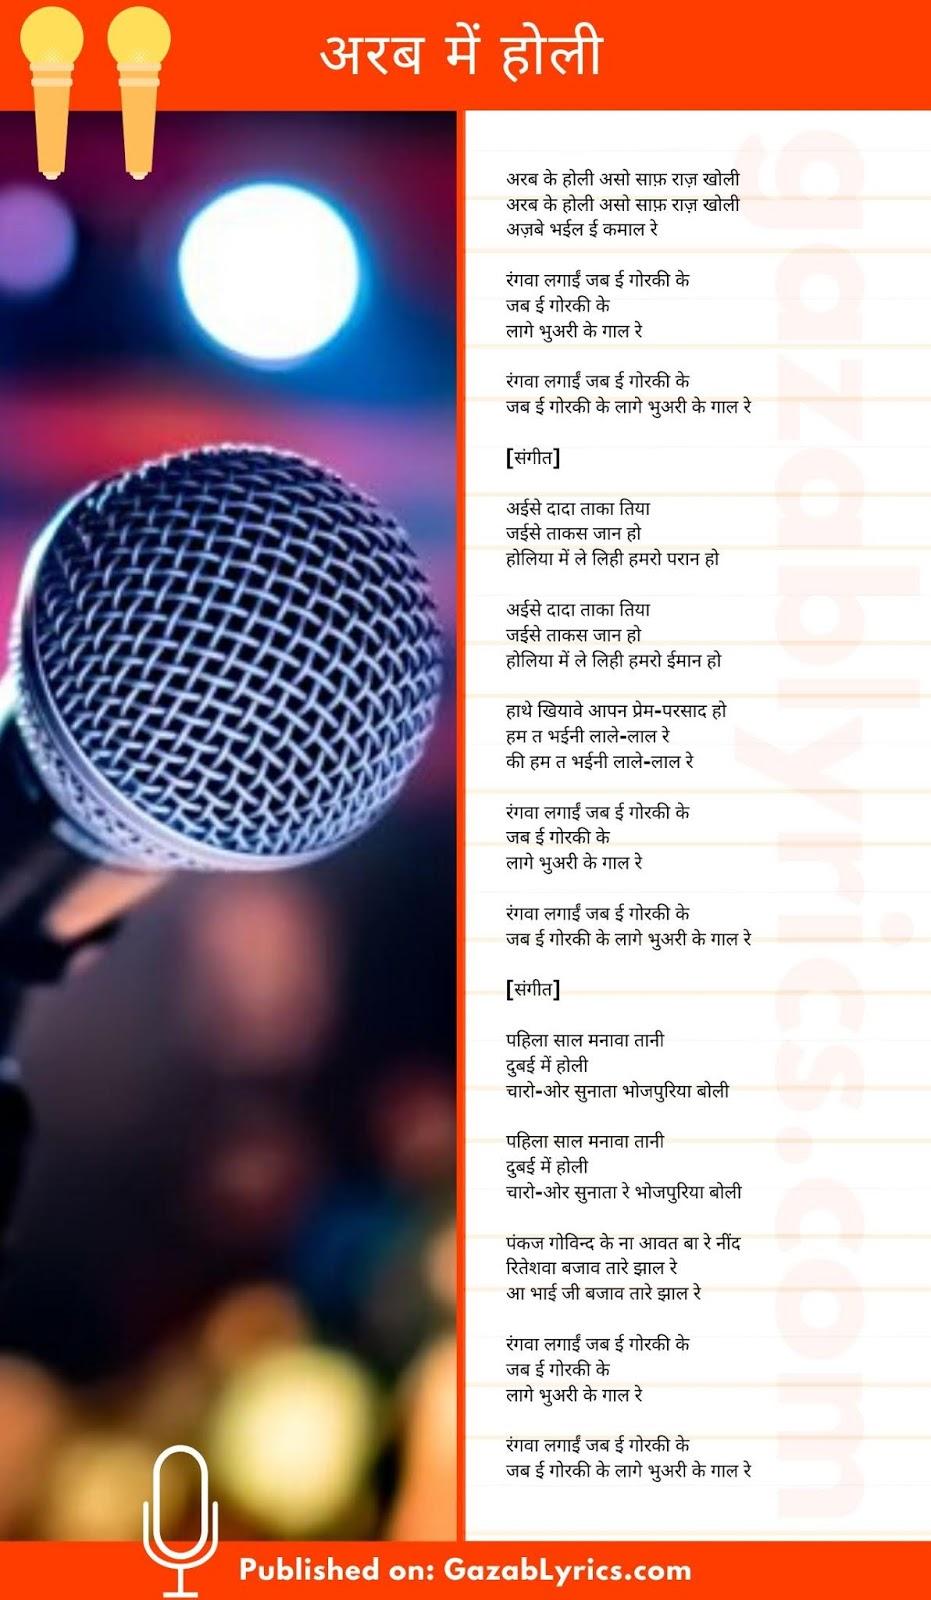 Arab me Holi song lyrics image